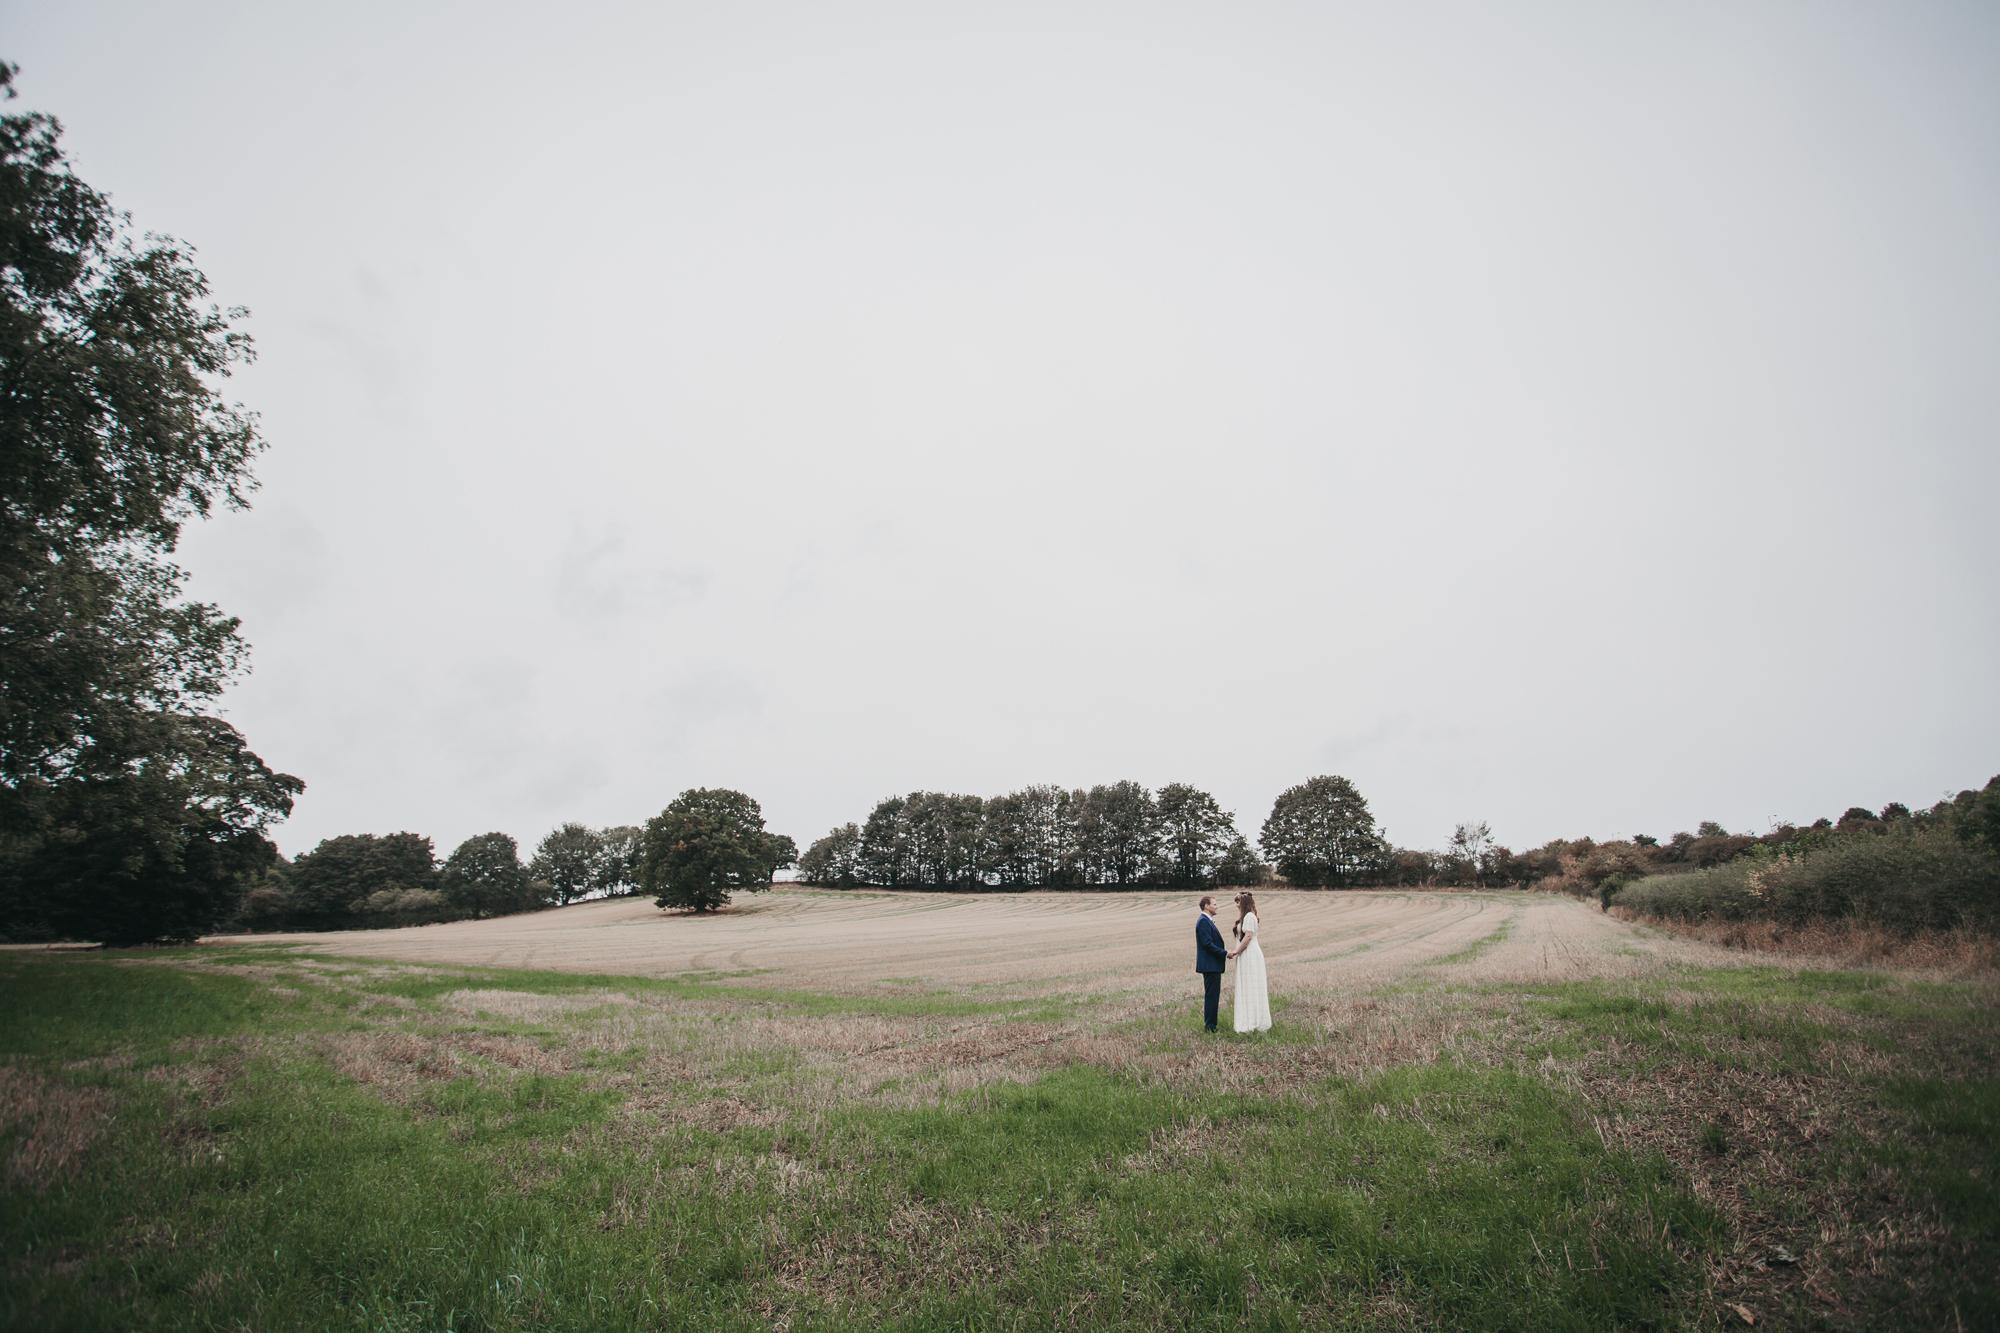 Kristy-Back-Garden-Outdoor-Wedding-Sheffield-Industrial-Warehouse-Wedding-Bohemian-Kate-Beaumont-Dahlia-Dress-28.jpg